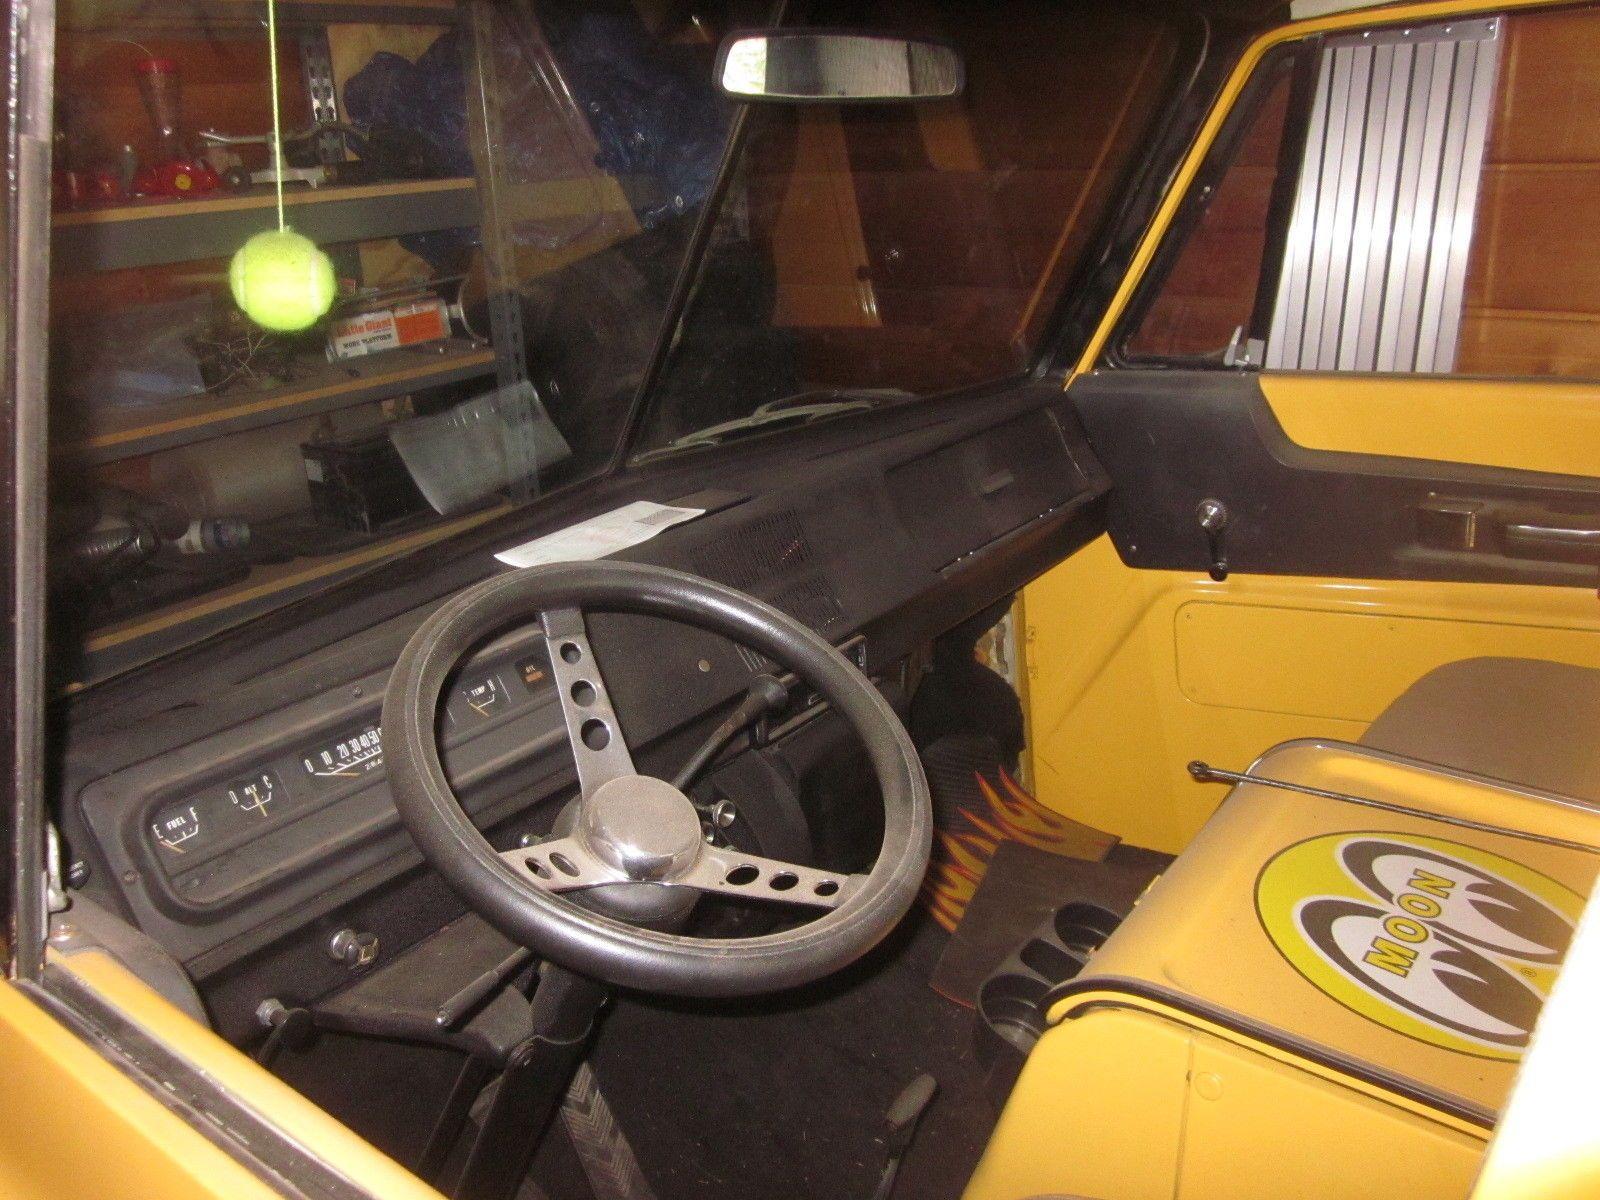 Details about 1968 dodge a108 van dodge engine rebuild